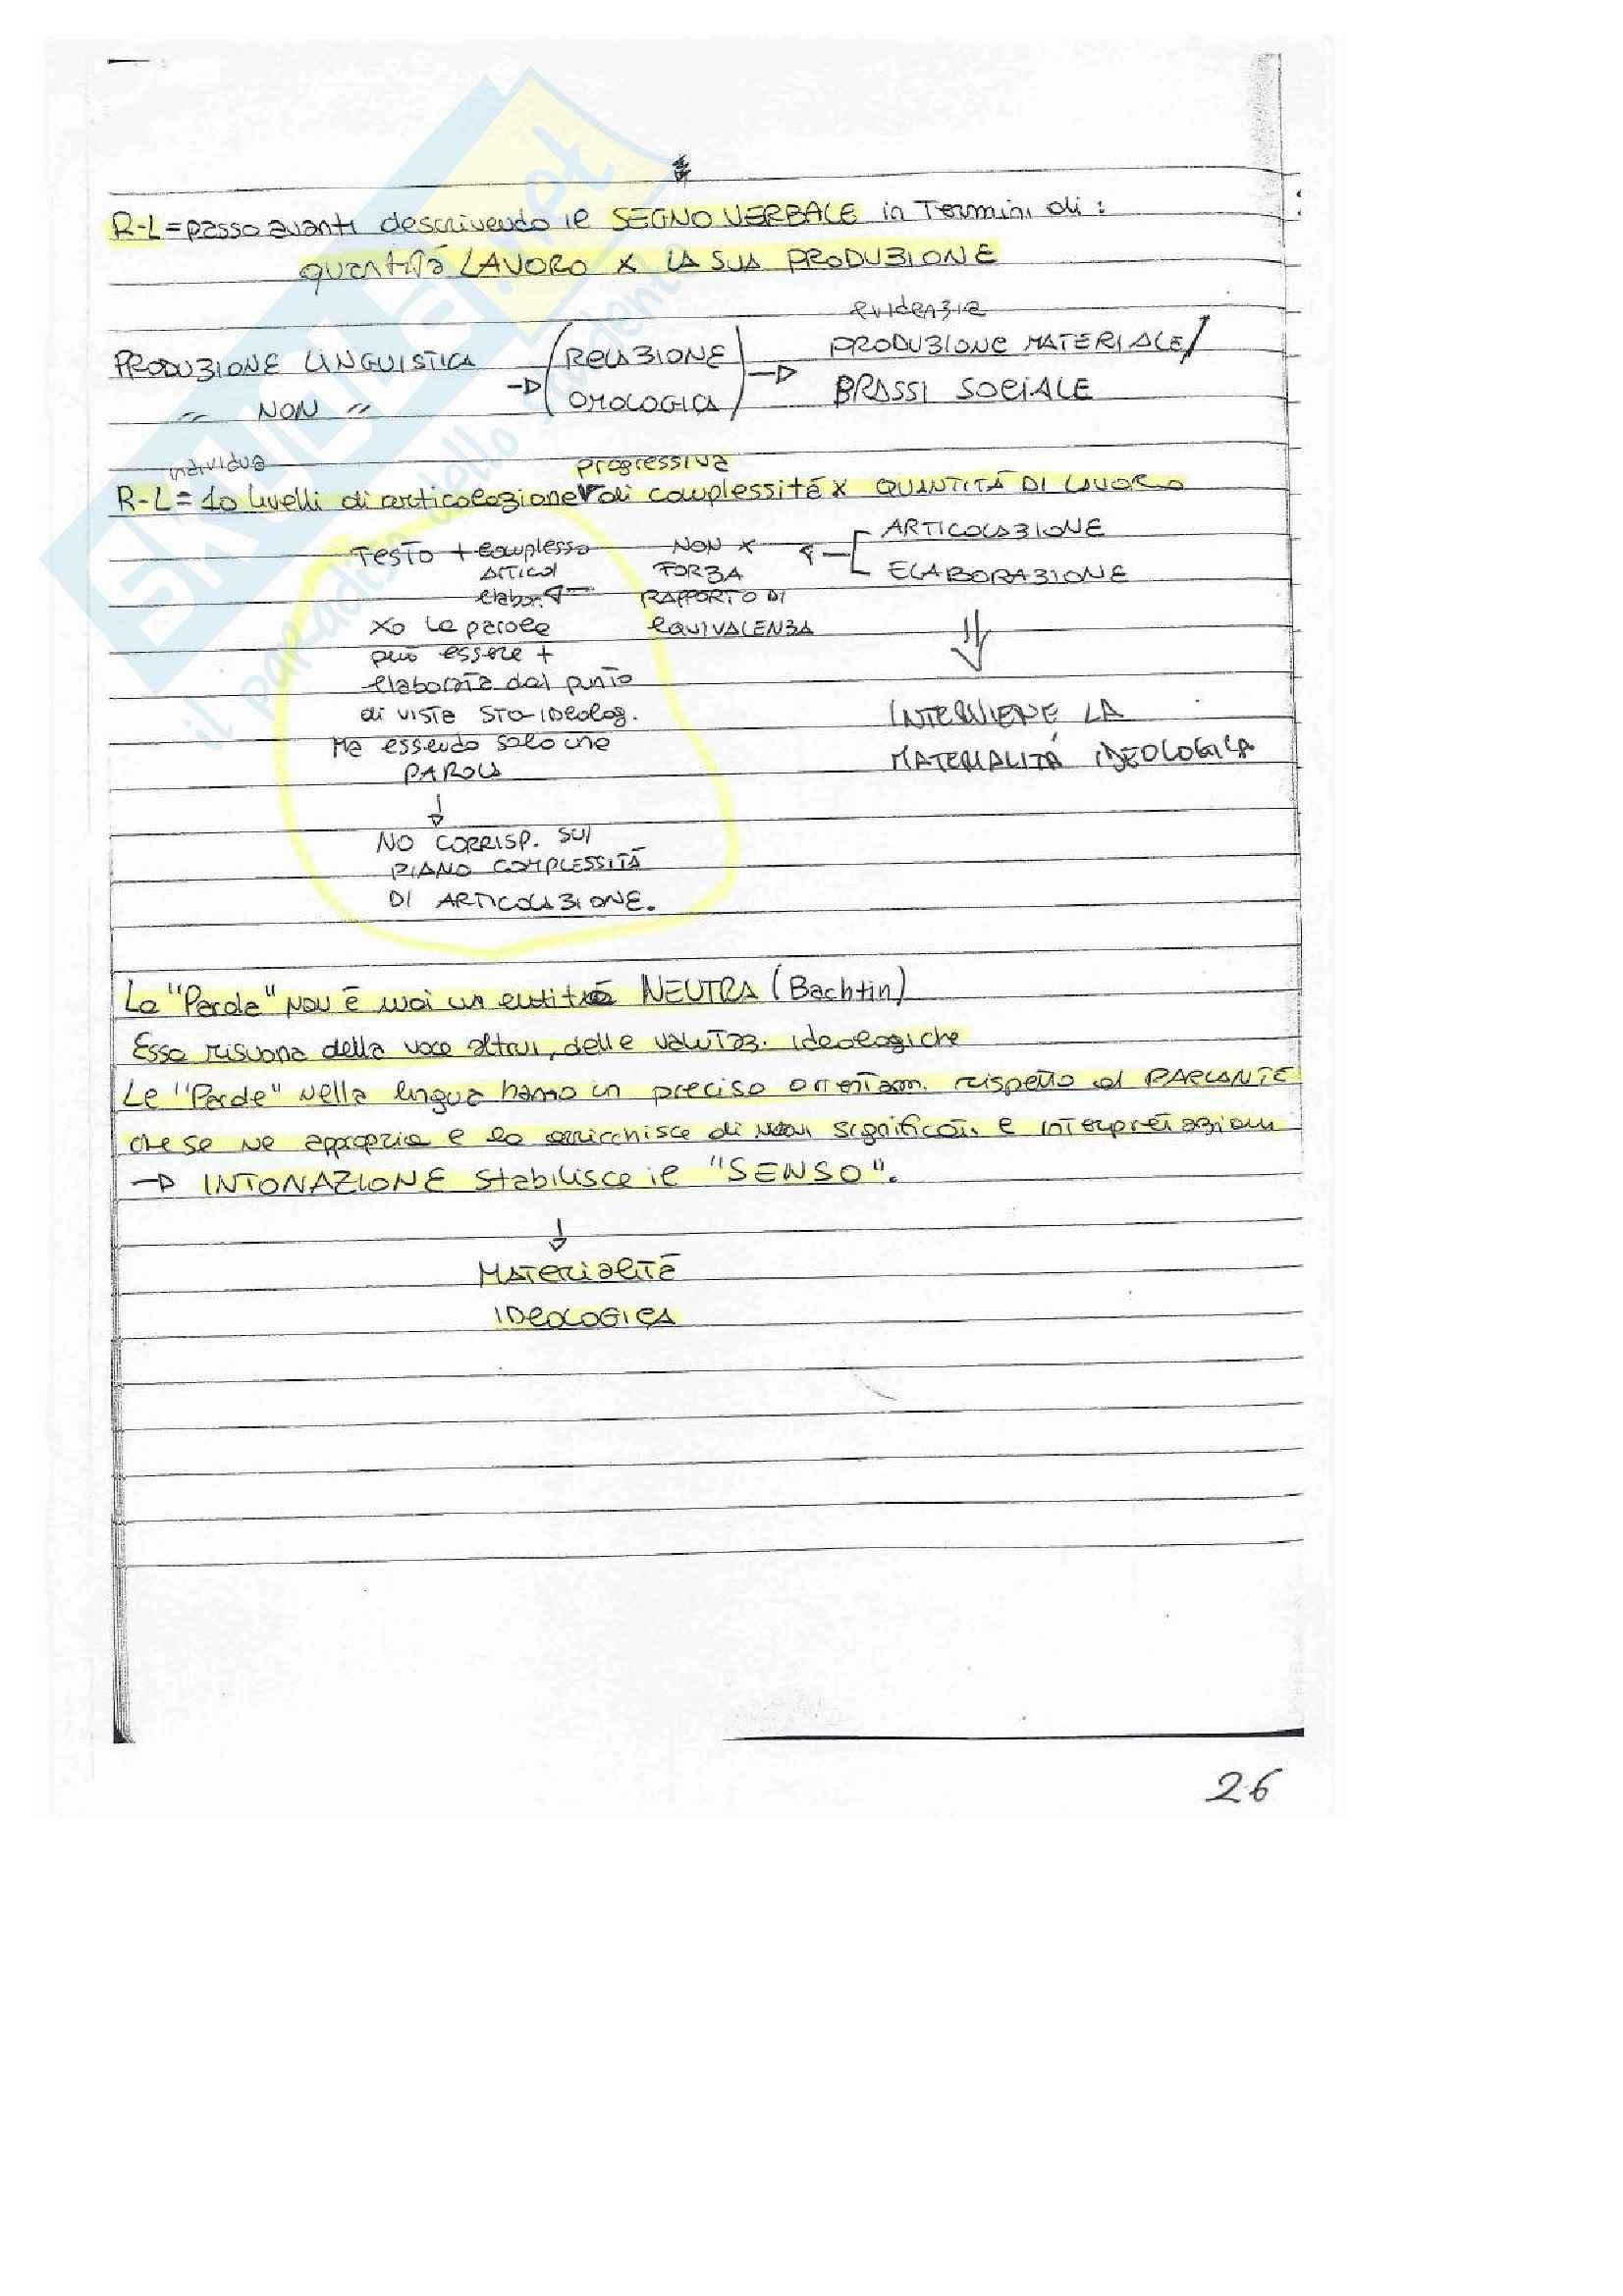 Semiotica, Appunti Pag. 26